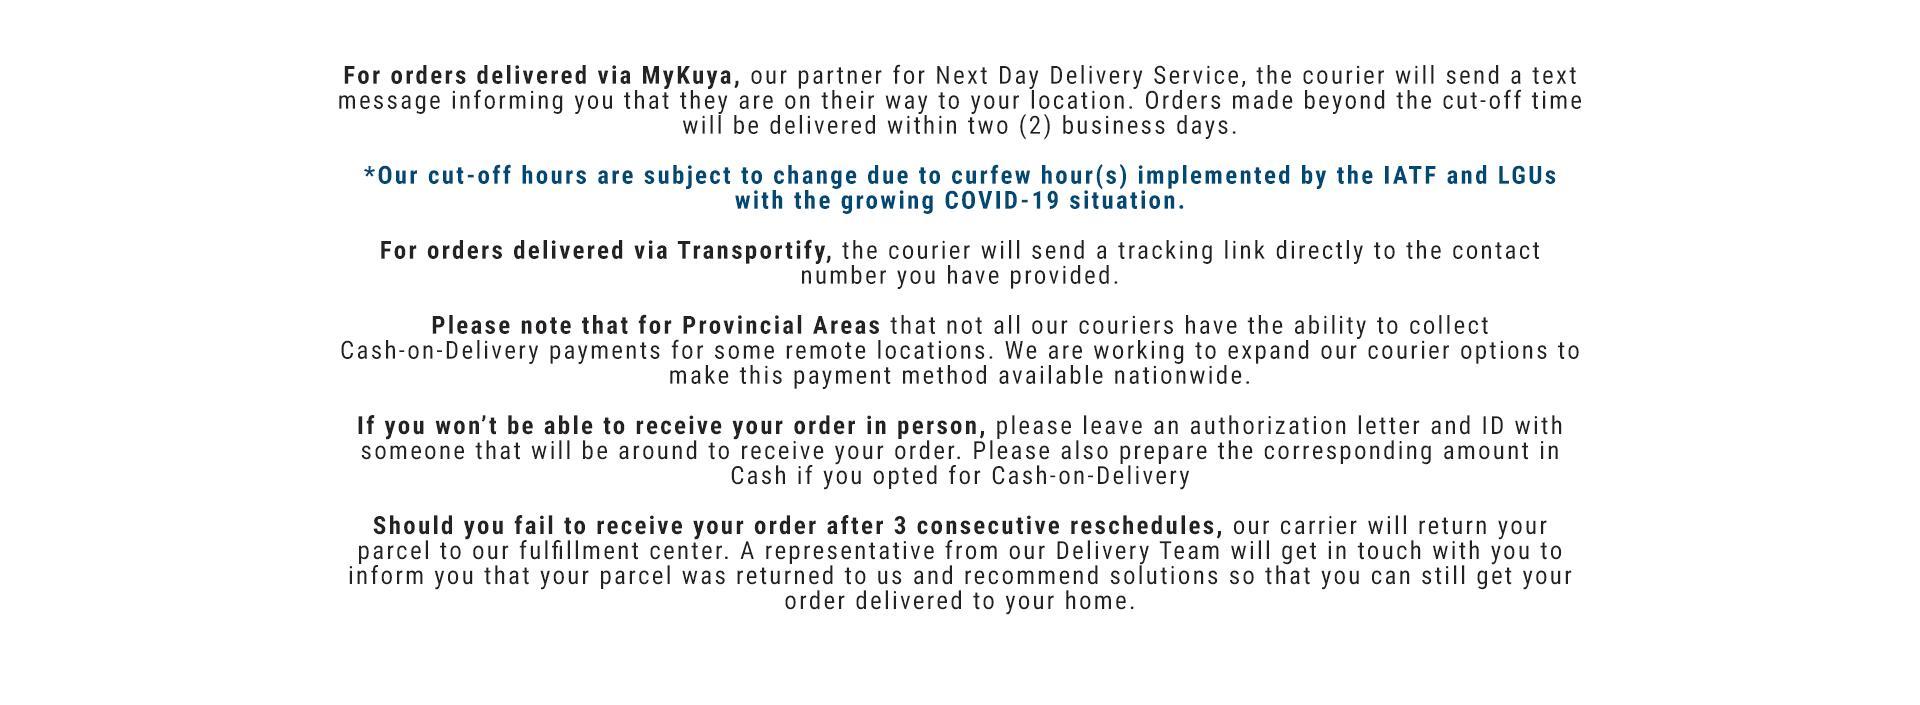 Decathlon Philippines Delivery Notices